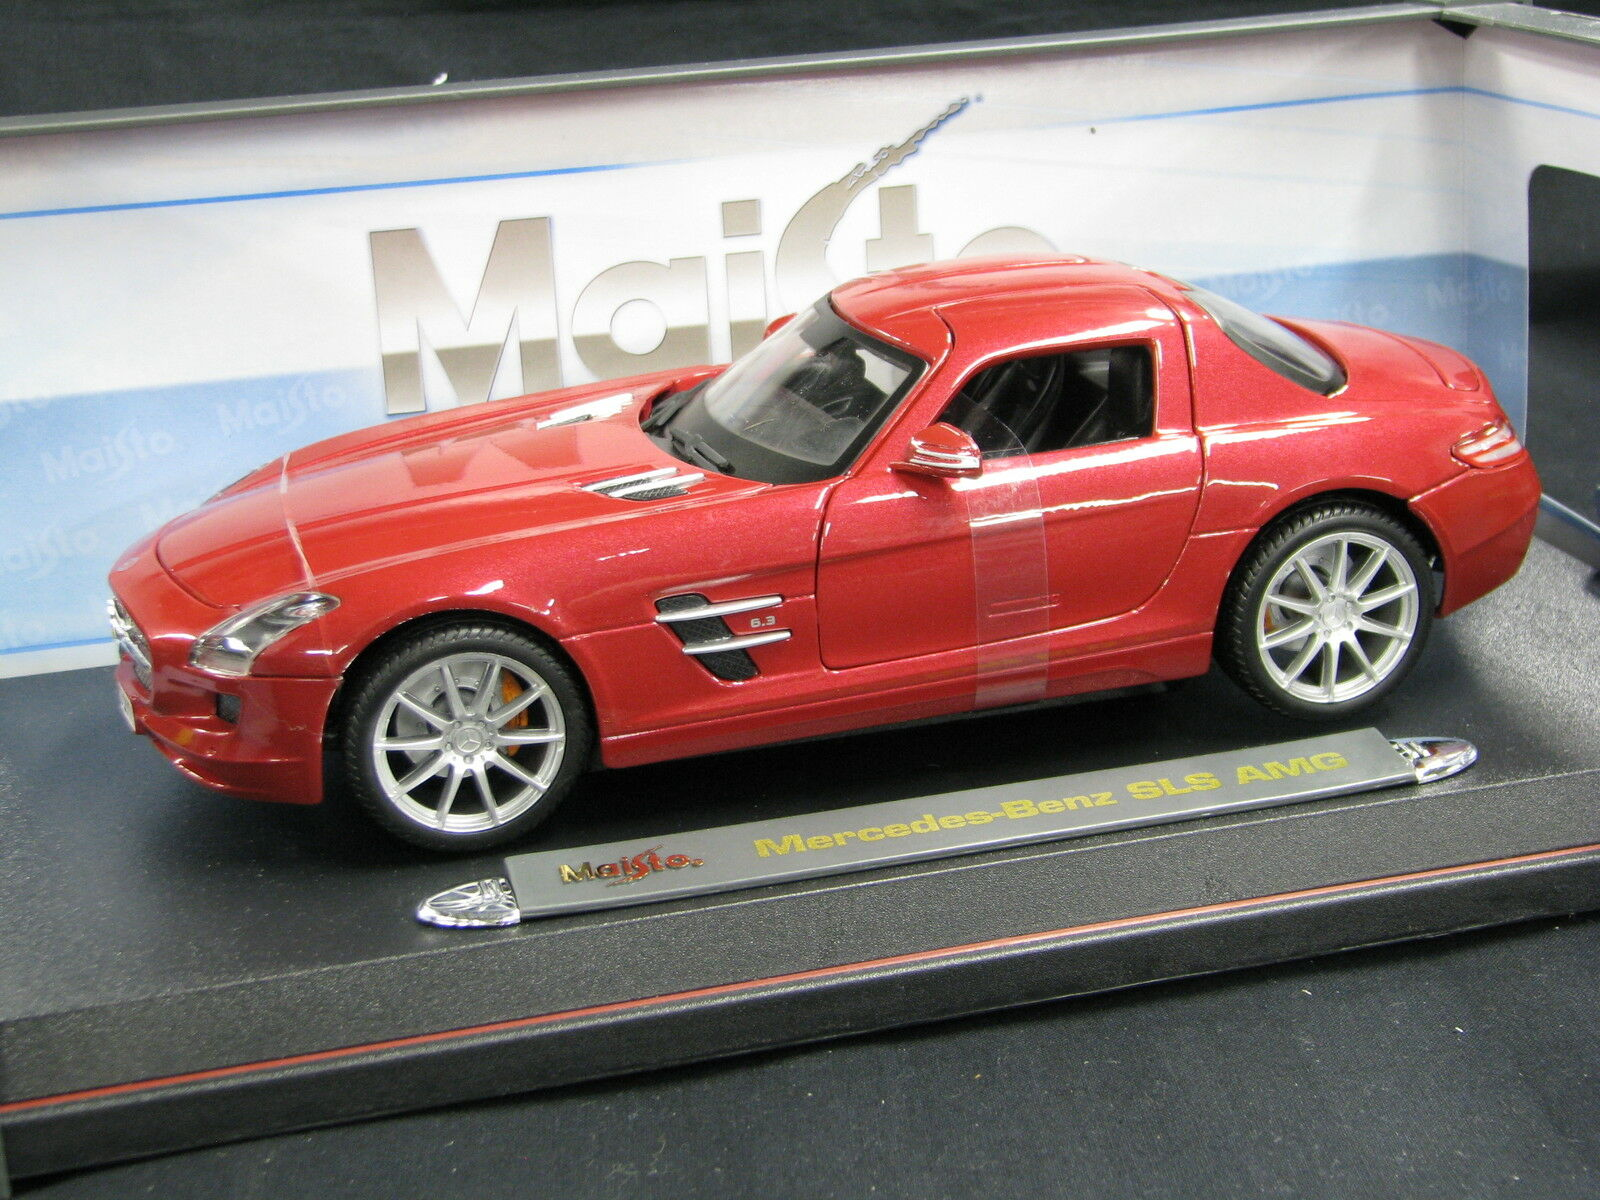 Maisto Mercedes-Benz SLS AMG 1 18 Metallic rojo